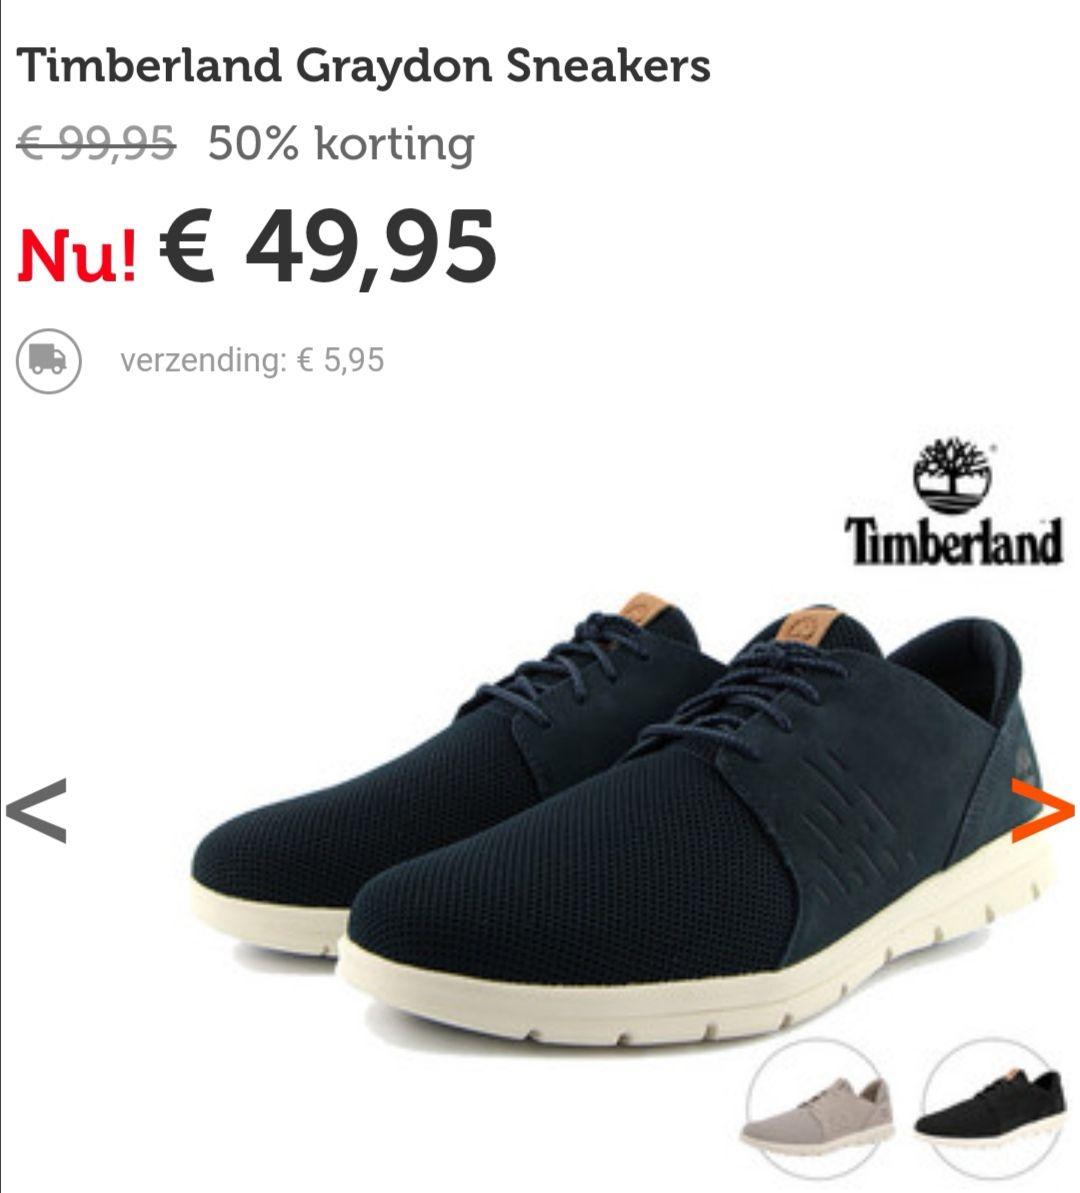 Timberland Graydon sneakers, bij iBood